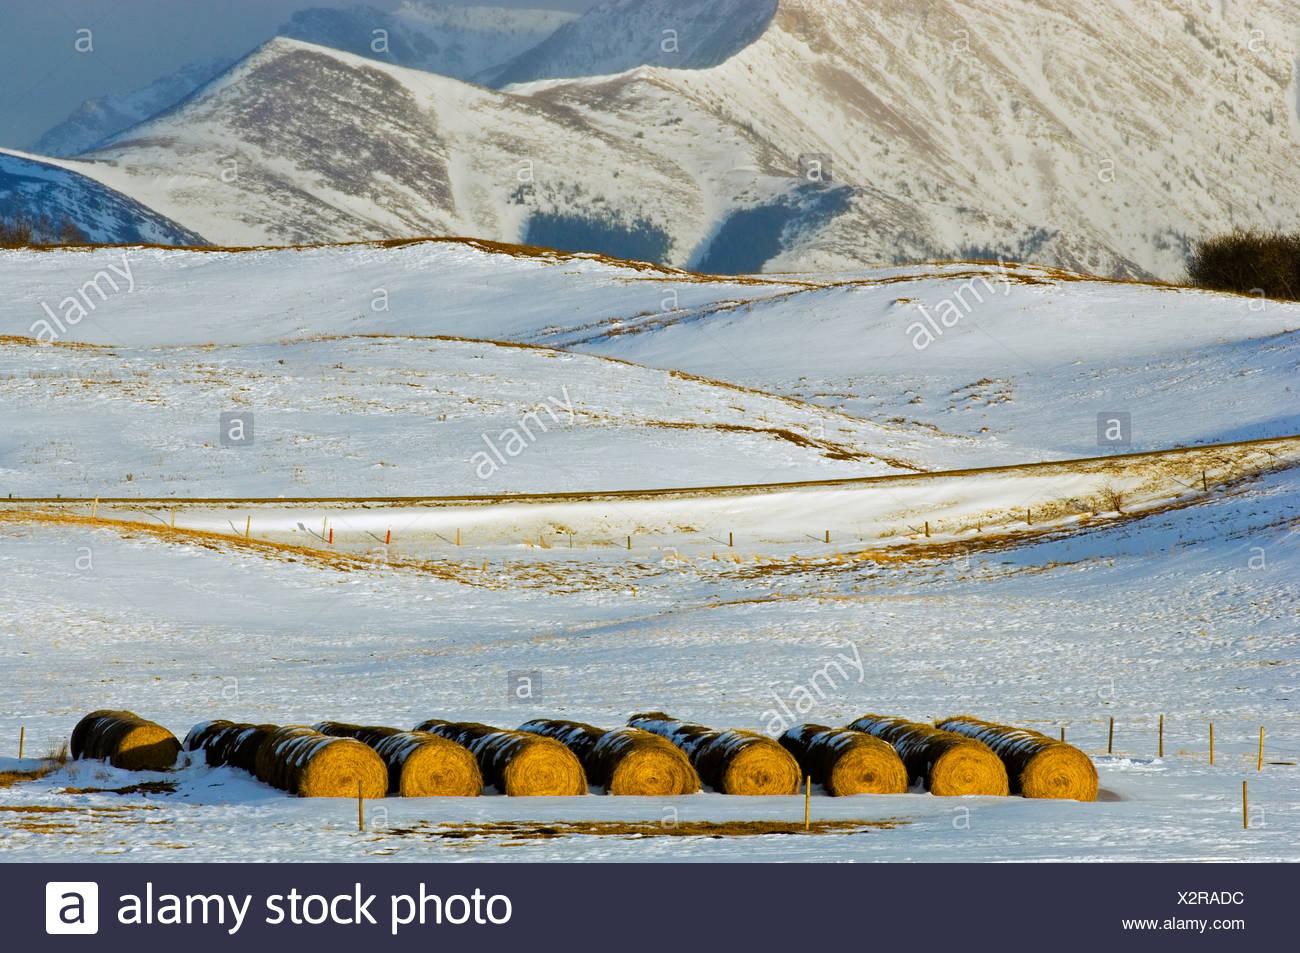 Hay bales in snowy field, Twin Butte, Alberta, Canada - Stock Image